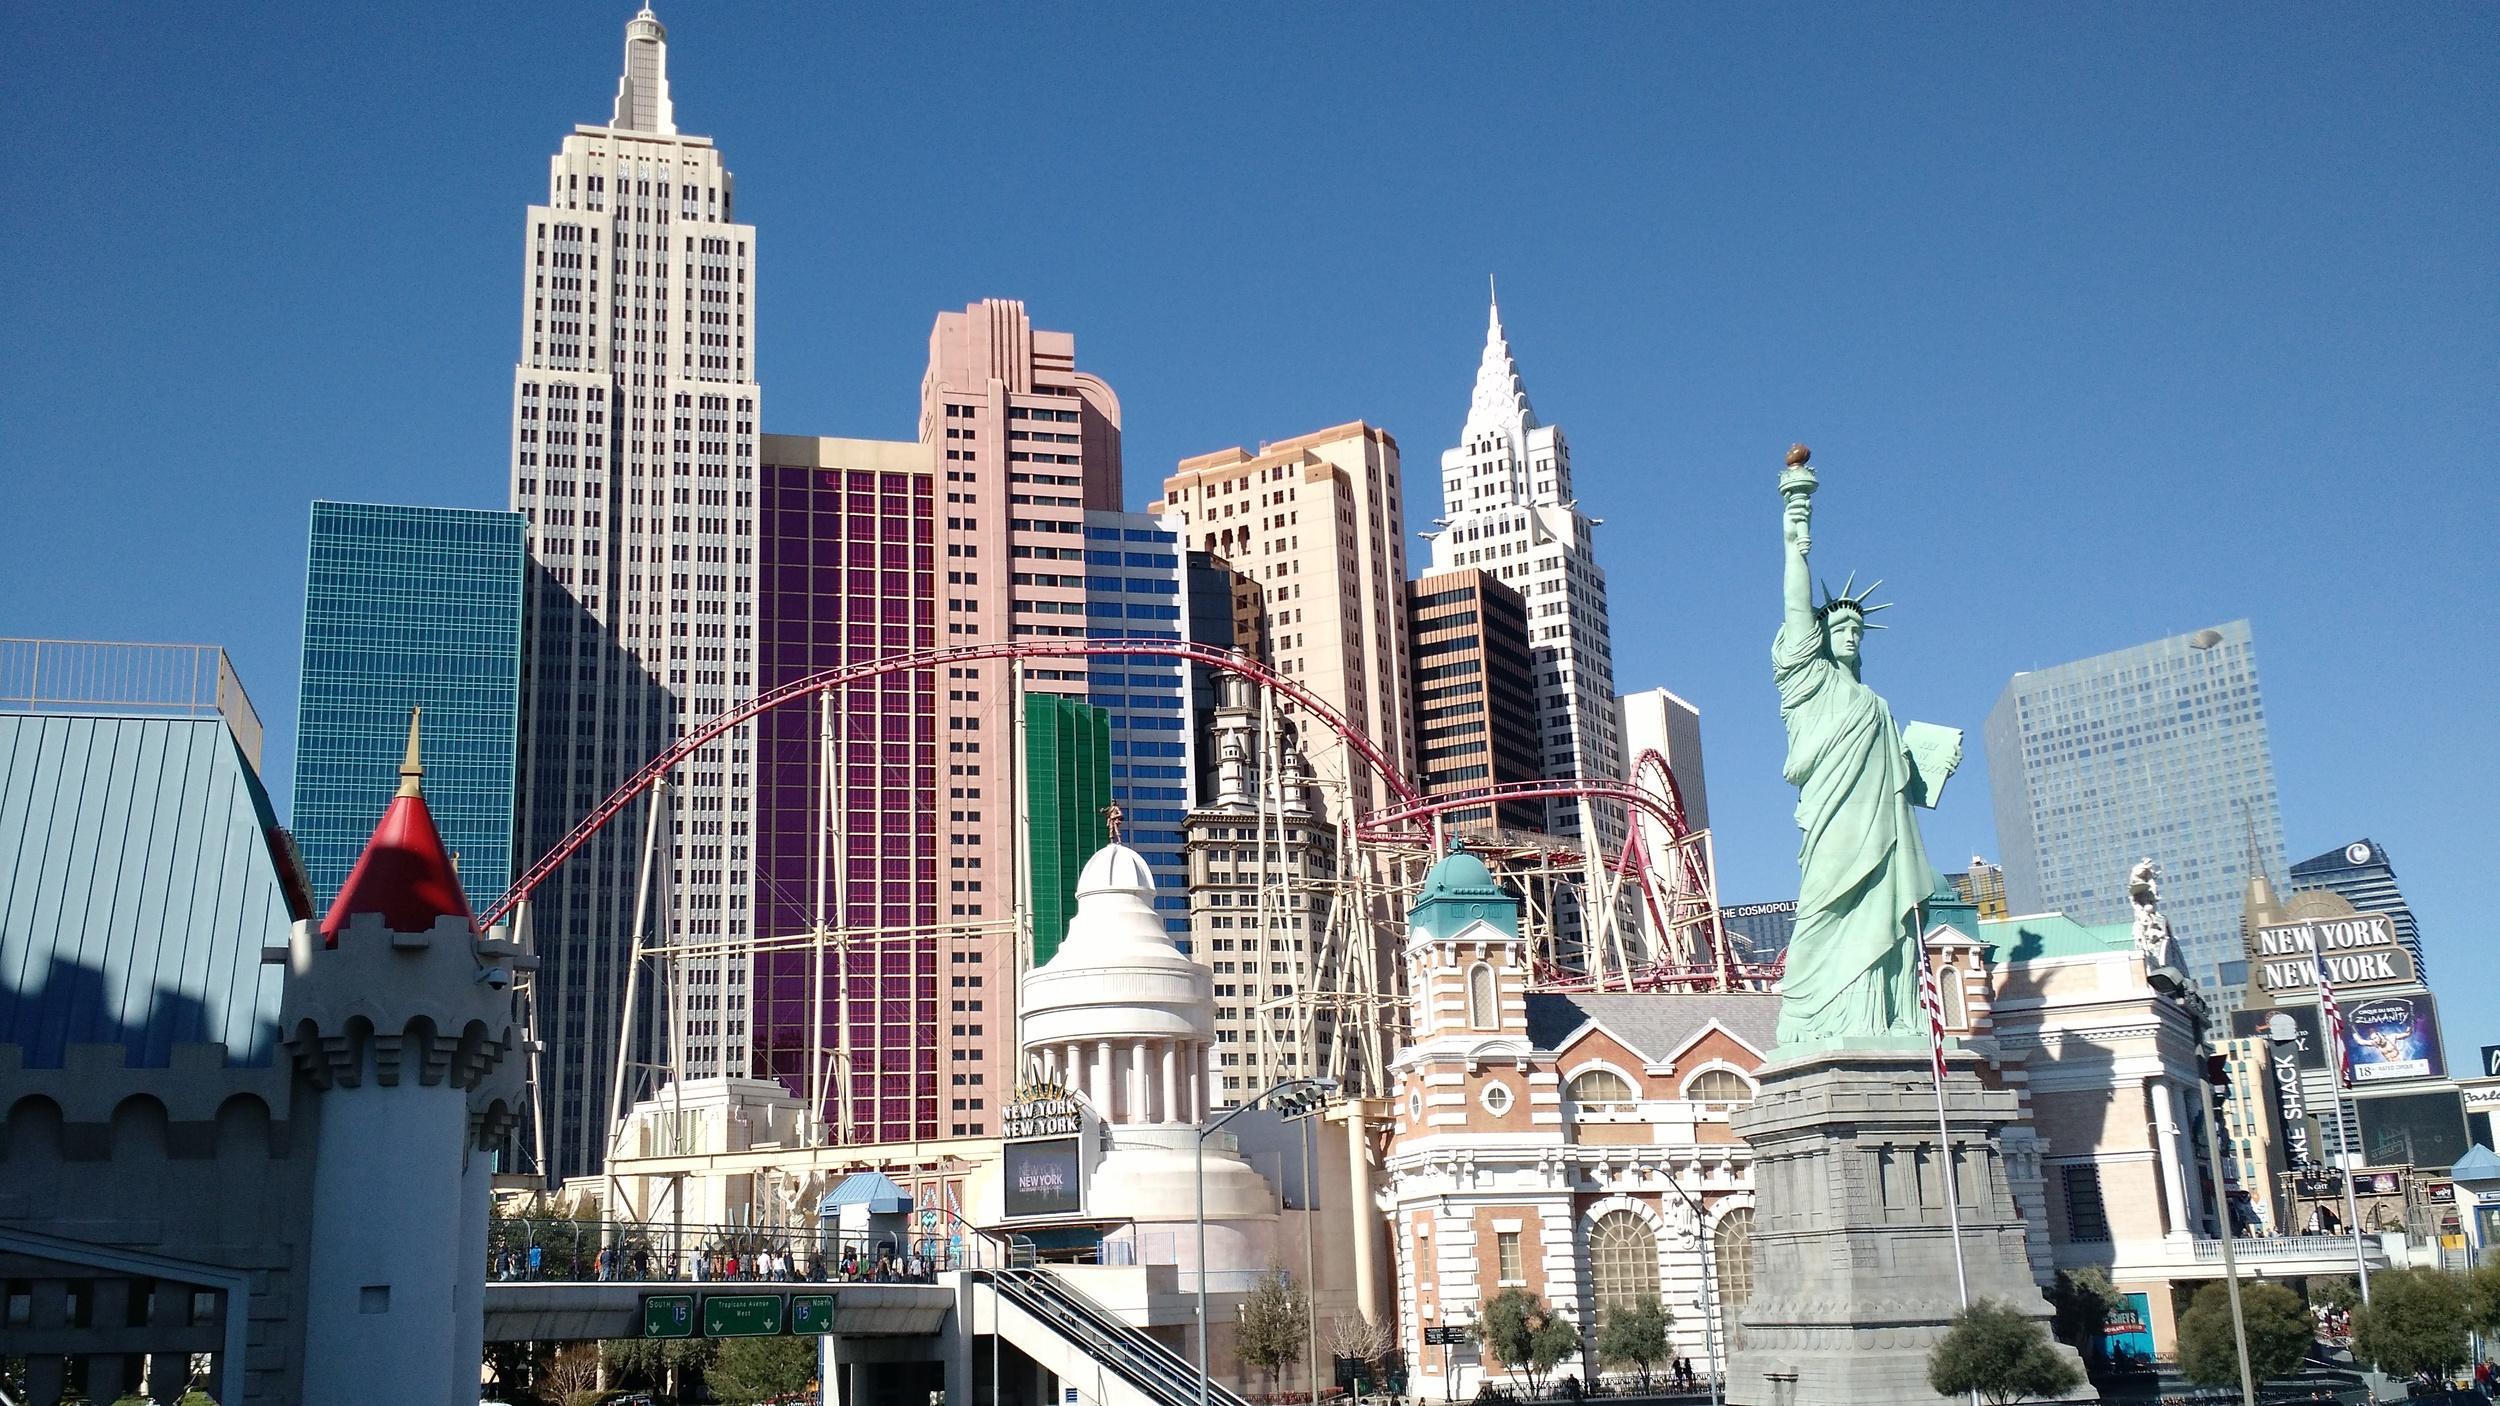 DAY 4 WALK NEW YORK HOTEL VIEW 1